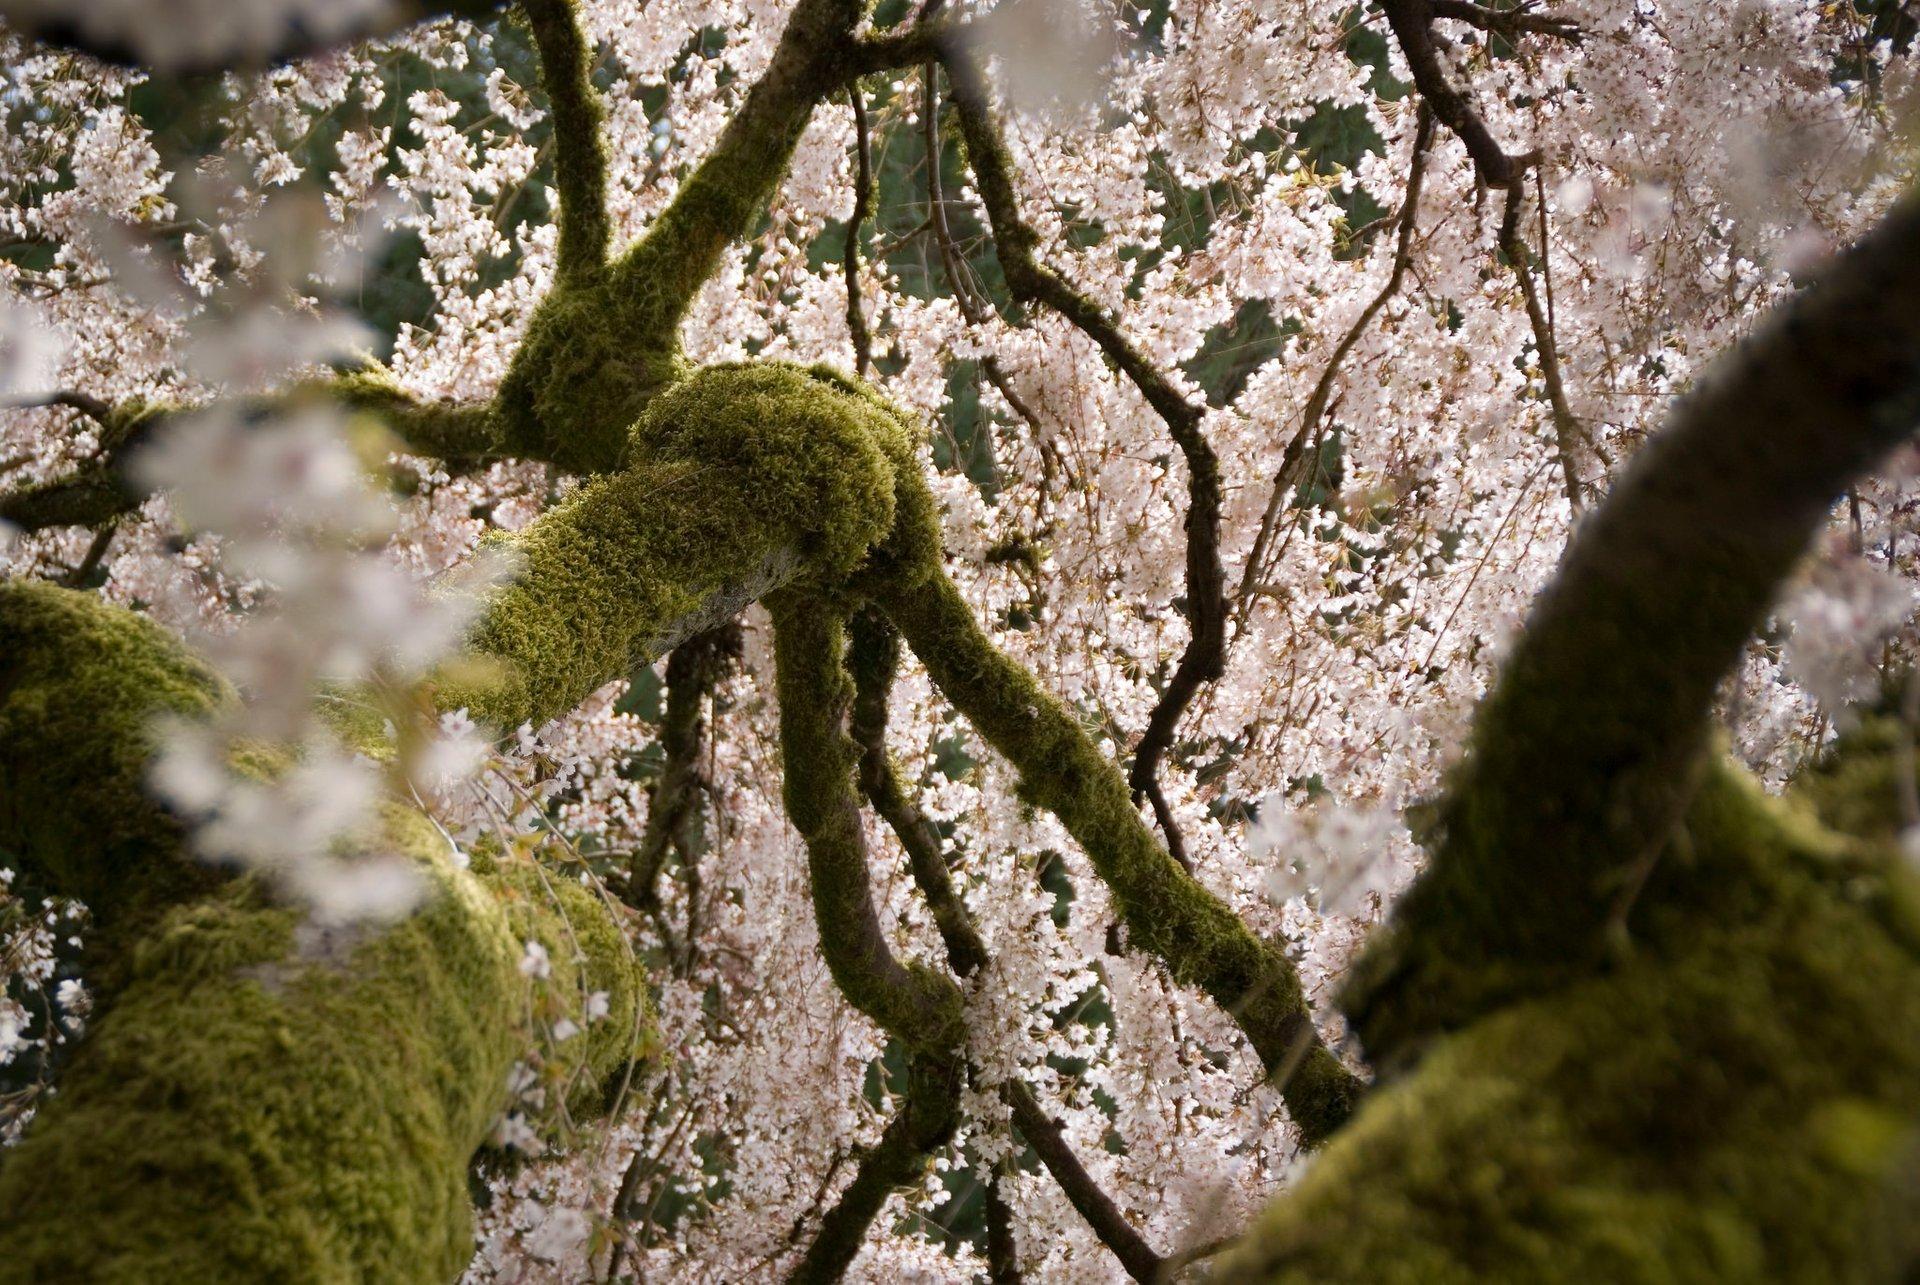 Washington Park Arboretum 2020